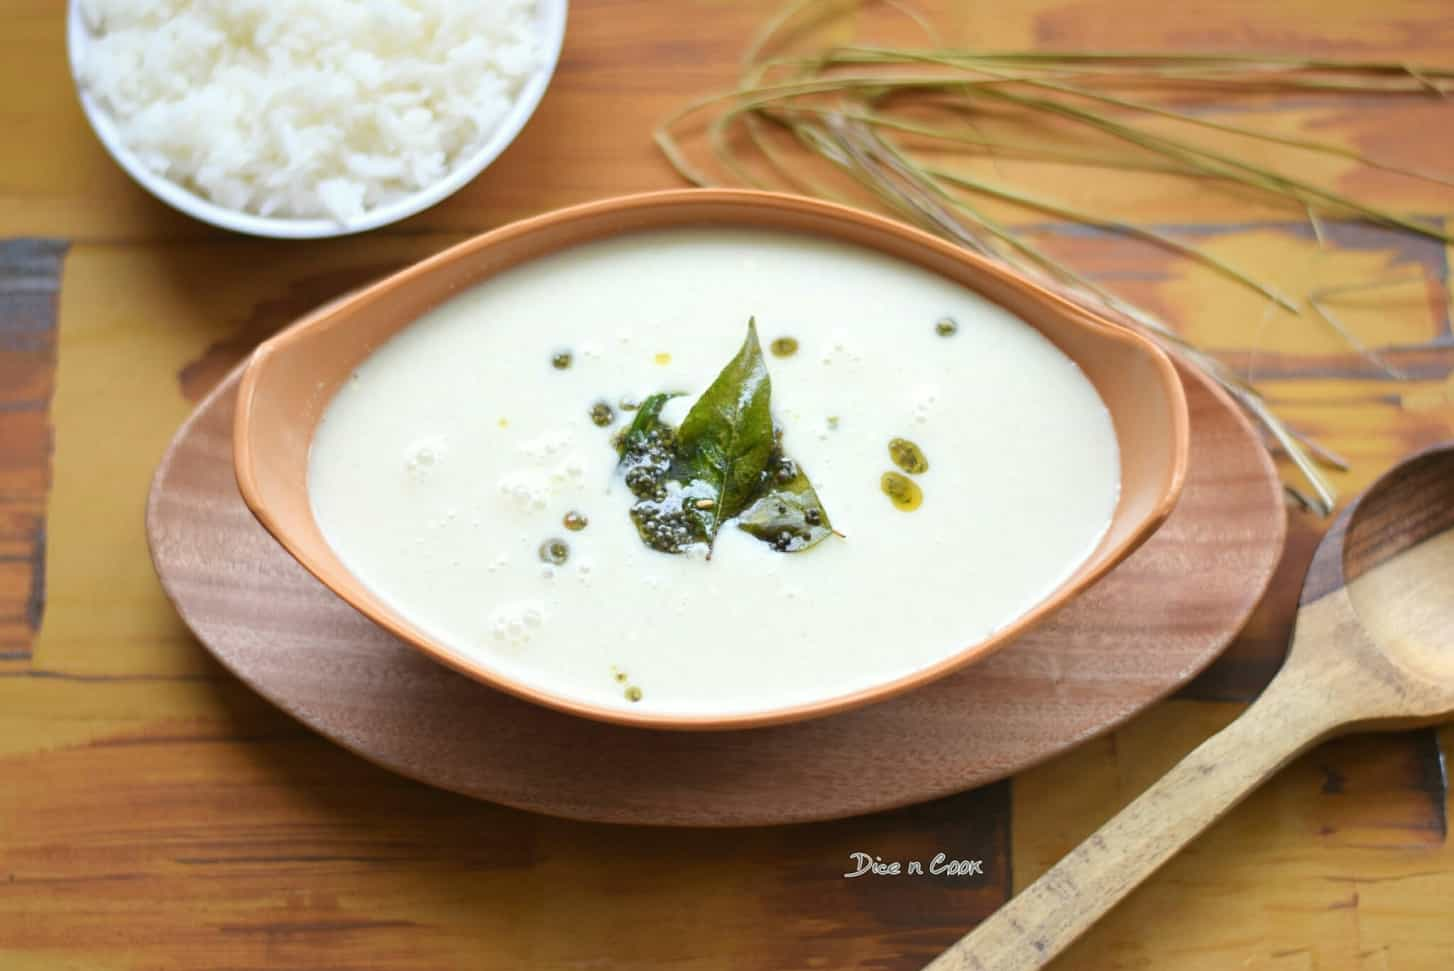 Lemon-Grass-Tambuli